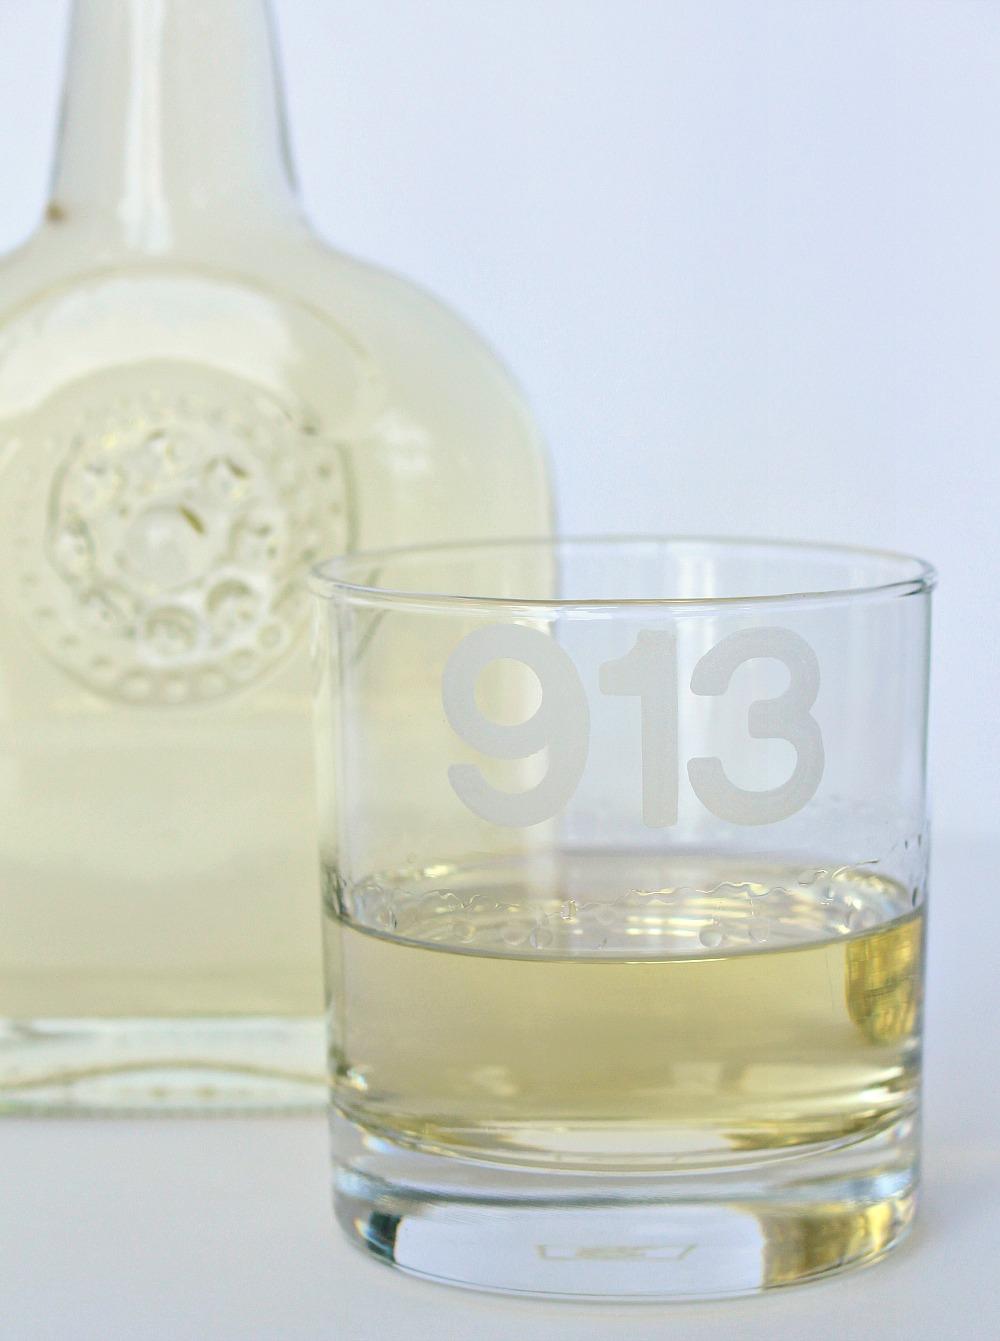 DIY vanilla infused vodka